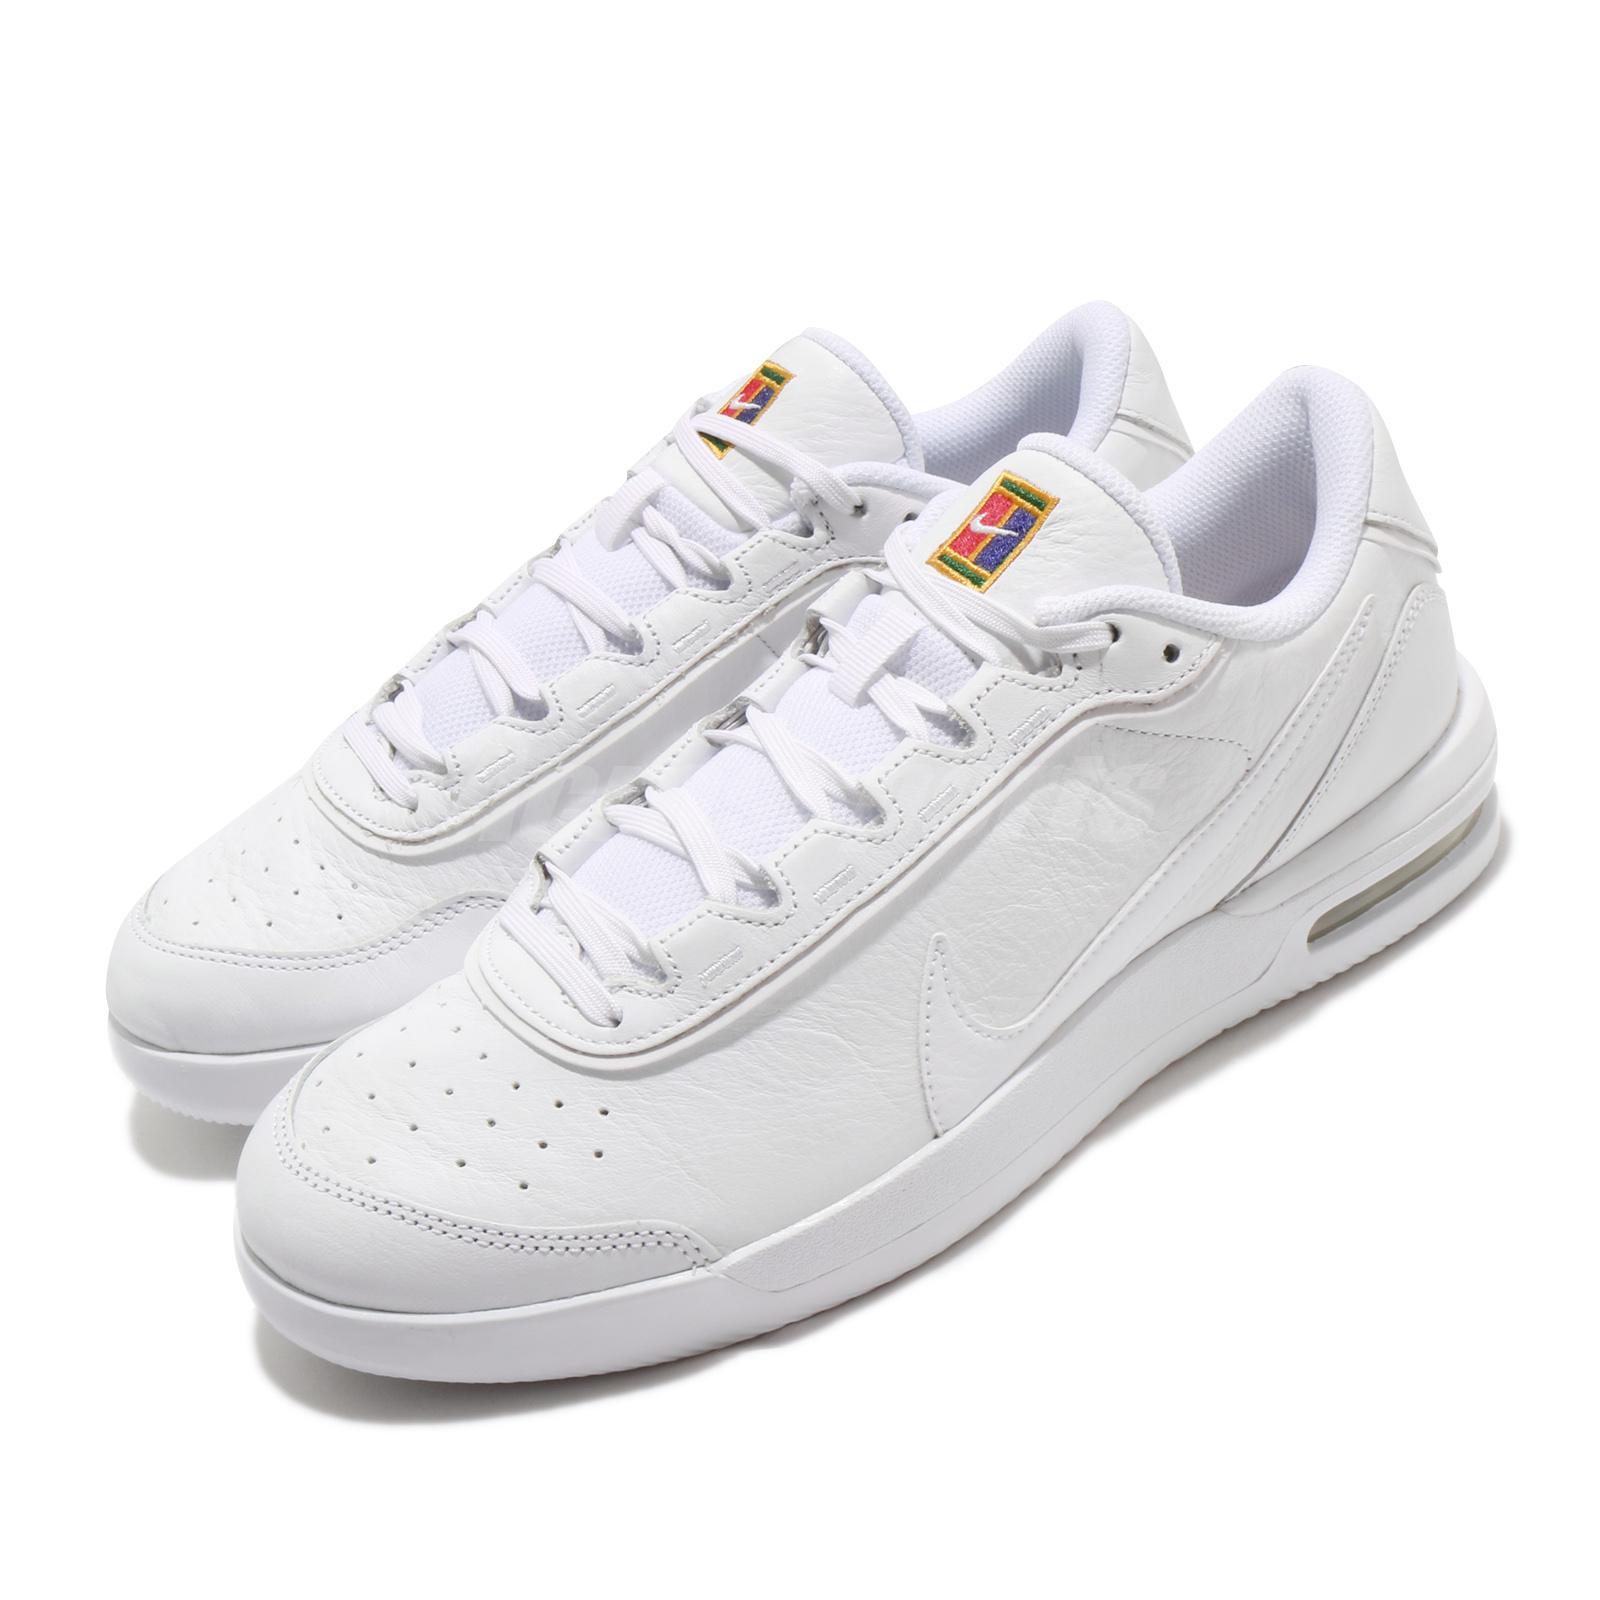 Details about Nike Air Max Vapor Wing PRM Chalk White Men Court Tennis Shoe  Sneaker CT3890-100